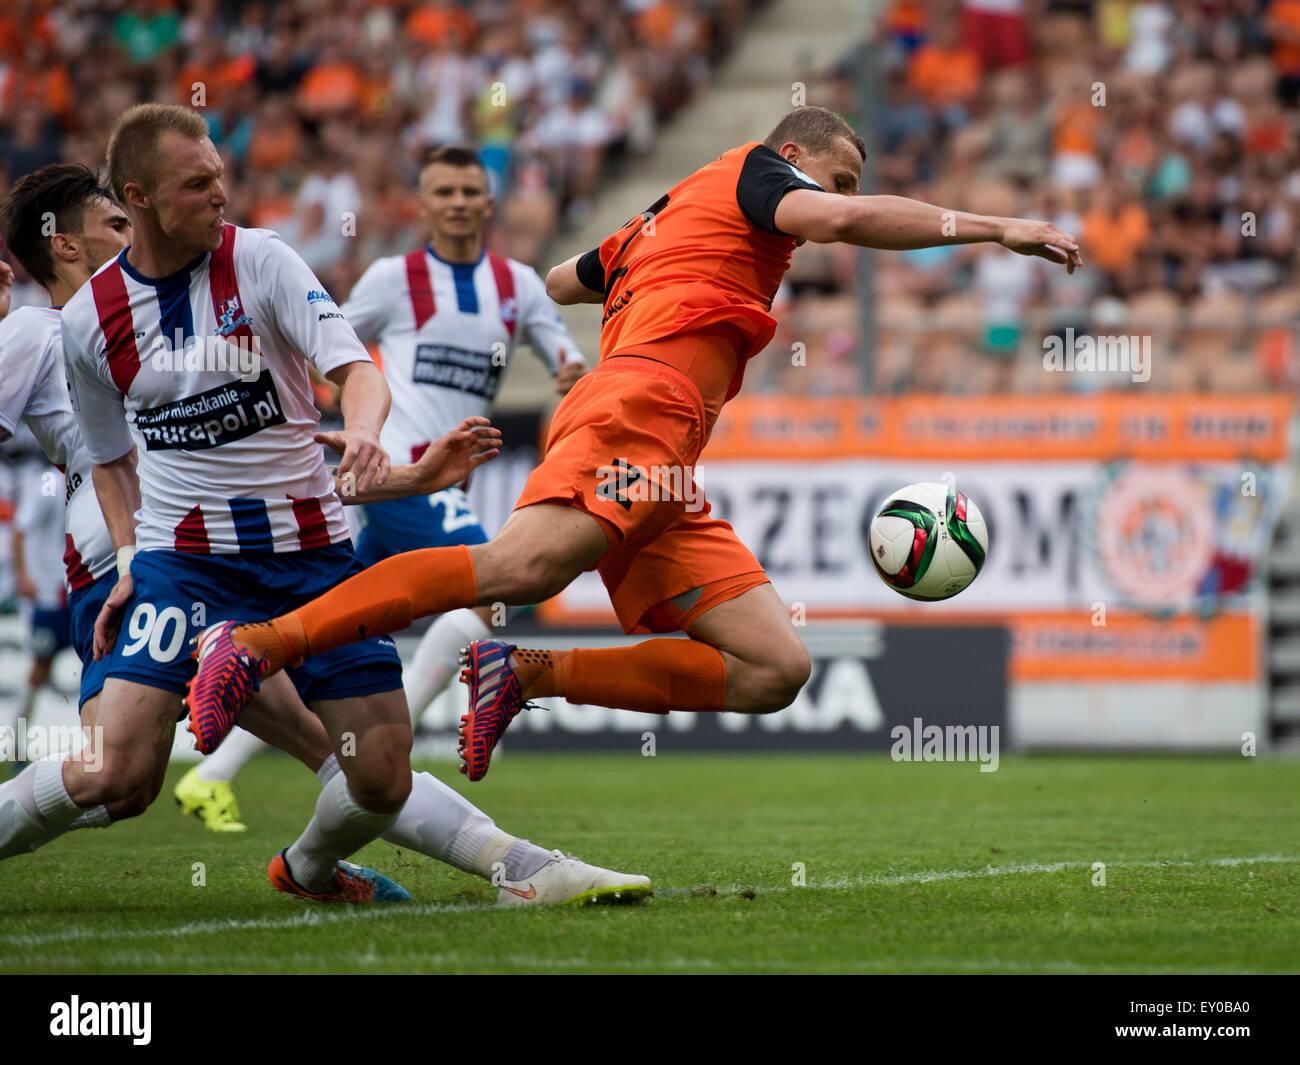 Lubin, Poland. 18th July, 2015, Maciej Dabrowski (2) in action during match Polish Premier League betwen KGHM Zaglebie - Stock Image